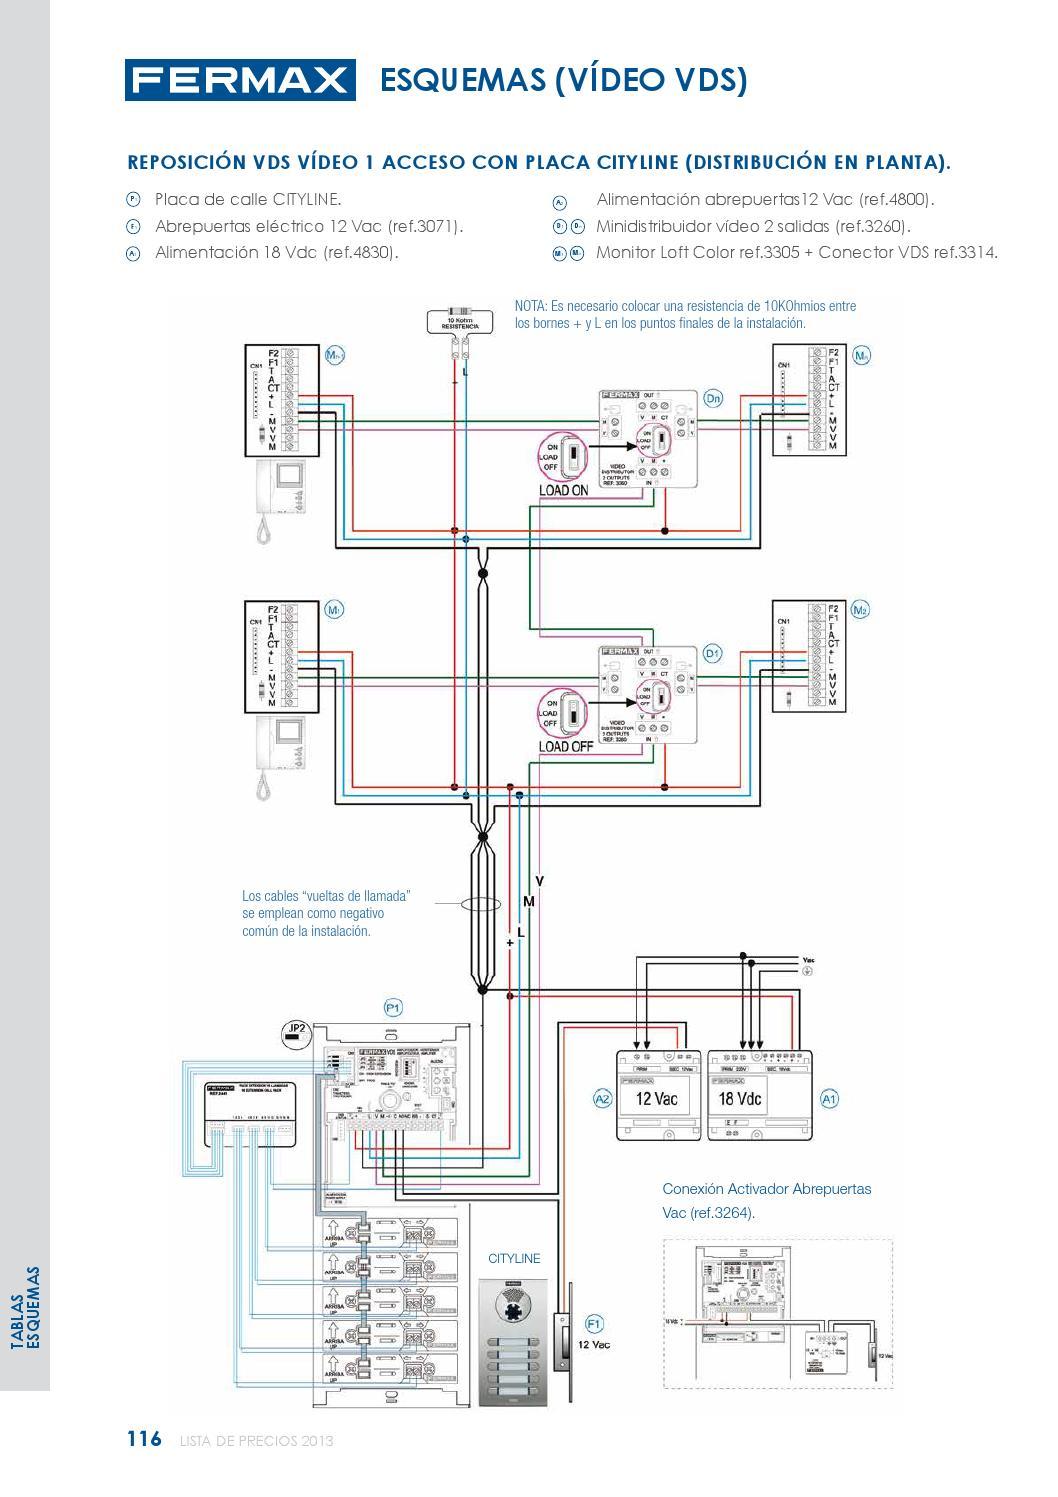 page_118 lista precios fermax 2013 by gomez moreno mijas sl issuu fermax cityline wiring diagram at cita.asia